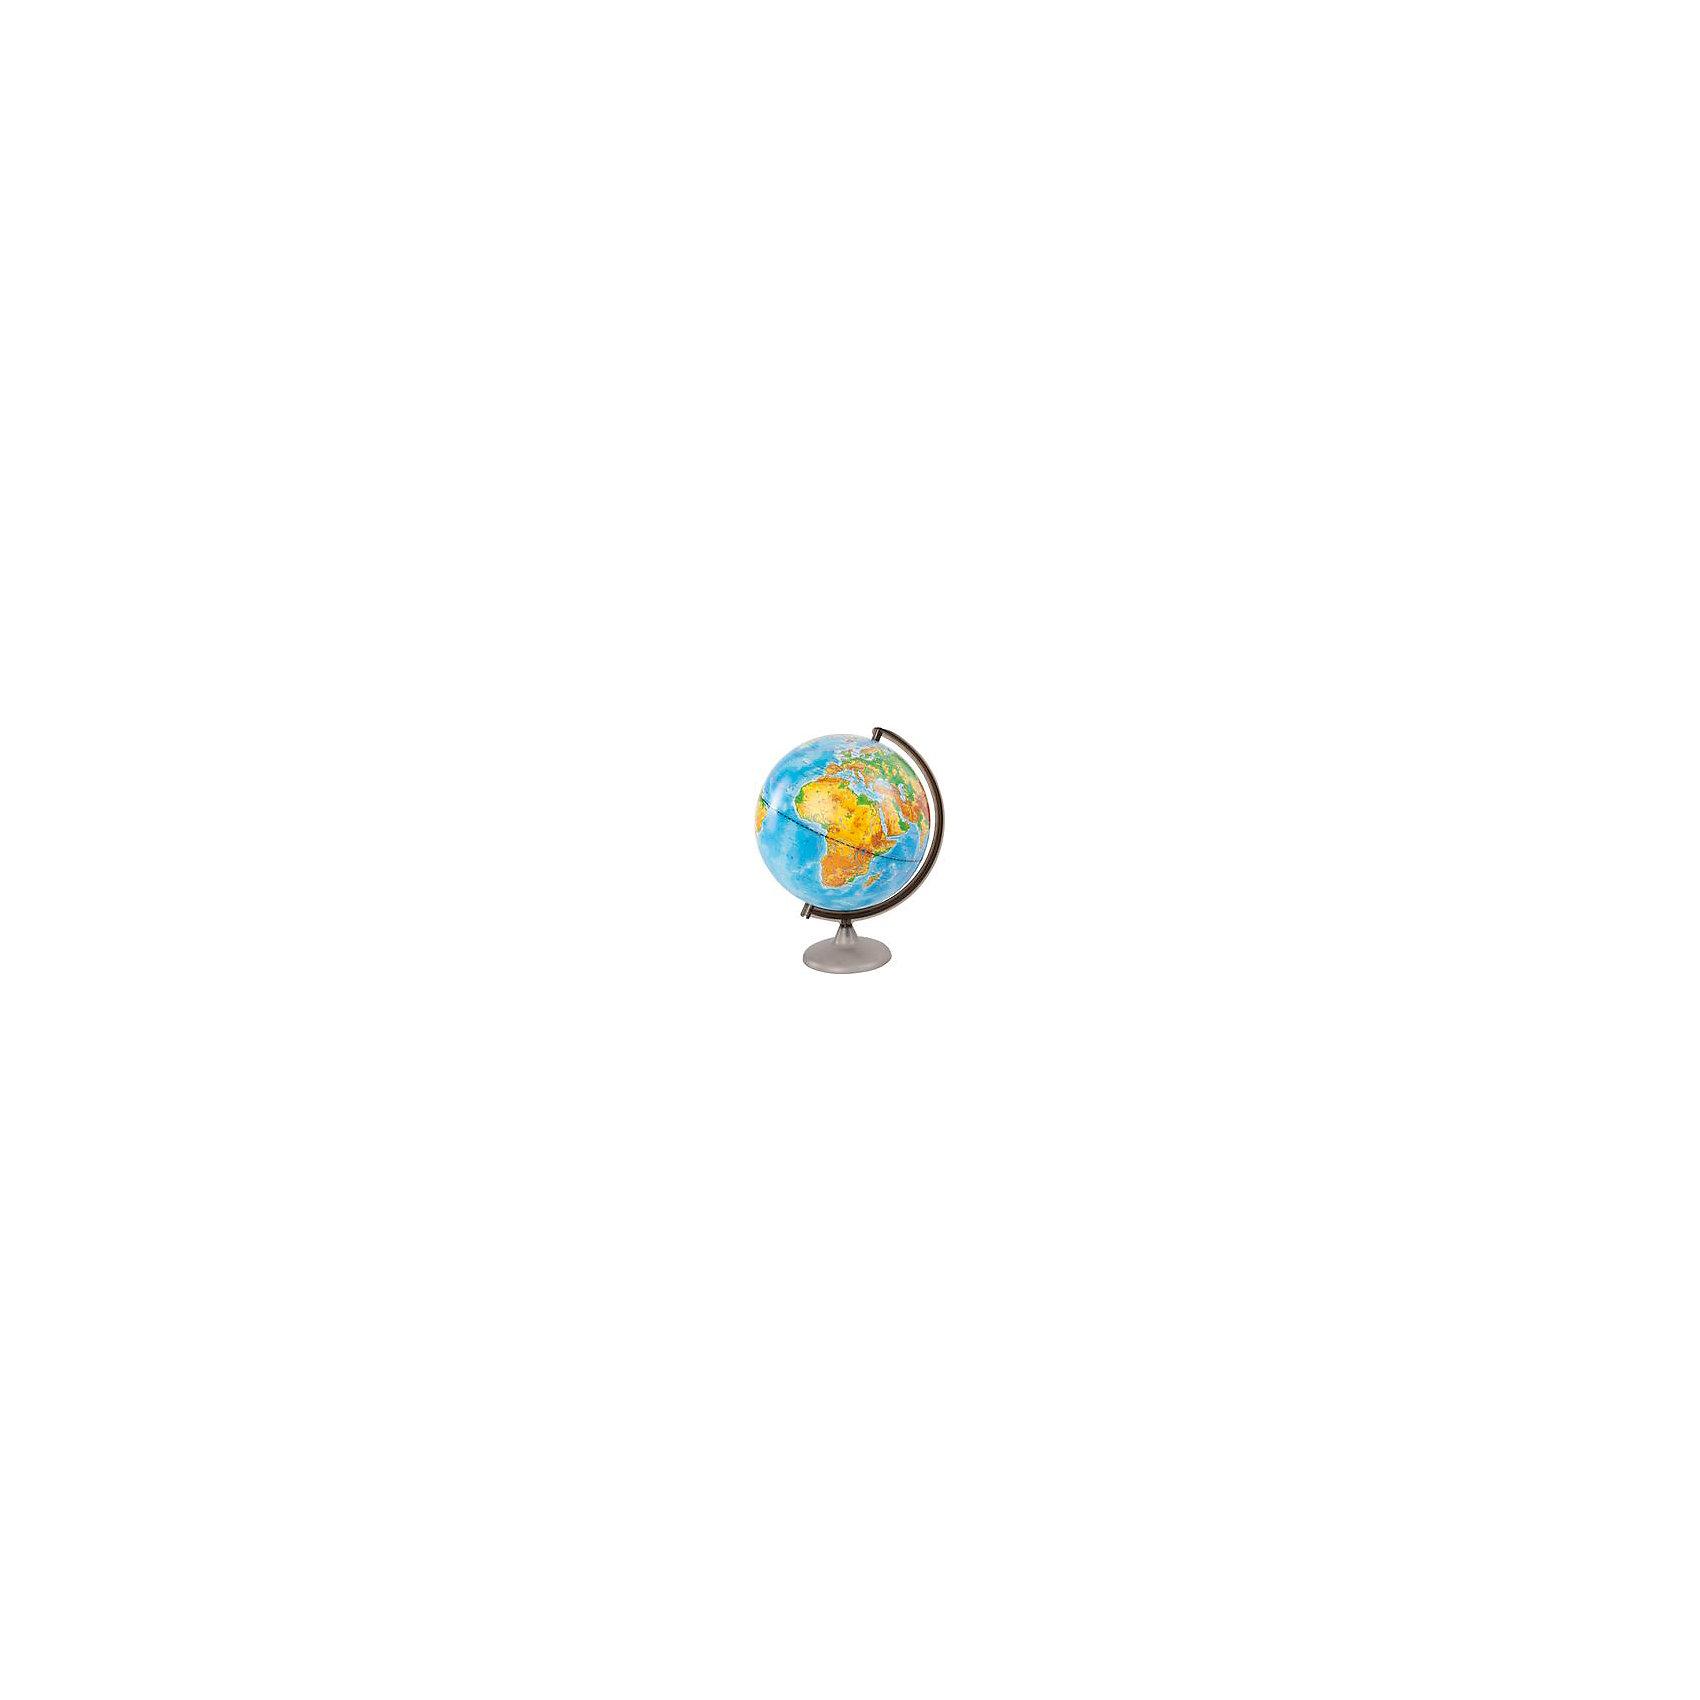 Глобус Земли физический, диаметр 320 ммДиаметр: 320 мм<br><br>Масштаб: 1:40000000<br><br>Материал подставки: Пластик<br><br>Цвет подставки: Черный<br><br>Ширина мм: 312<br>Глубина мм: 321<br>Высота мм: 345<br>Вес г: 950<br>Возраст от месяцев: 72<br>Возраст до месяцев: 2147483647<br>Пол: Унисекс<br>Возраст: Детский<br>SKU: 5518207